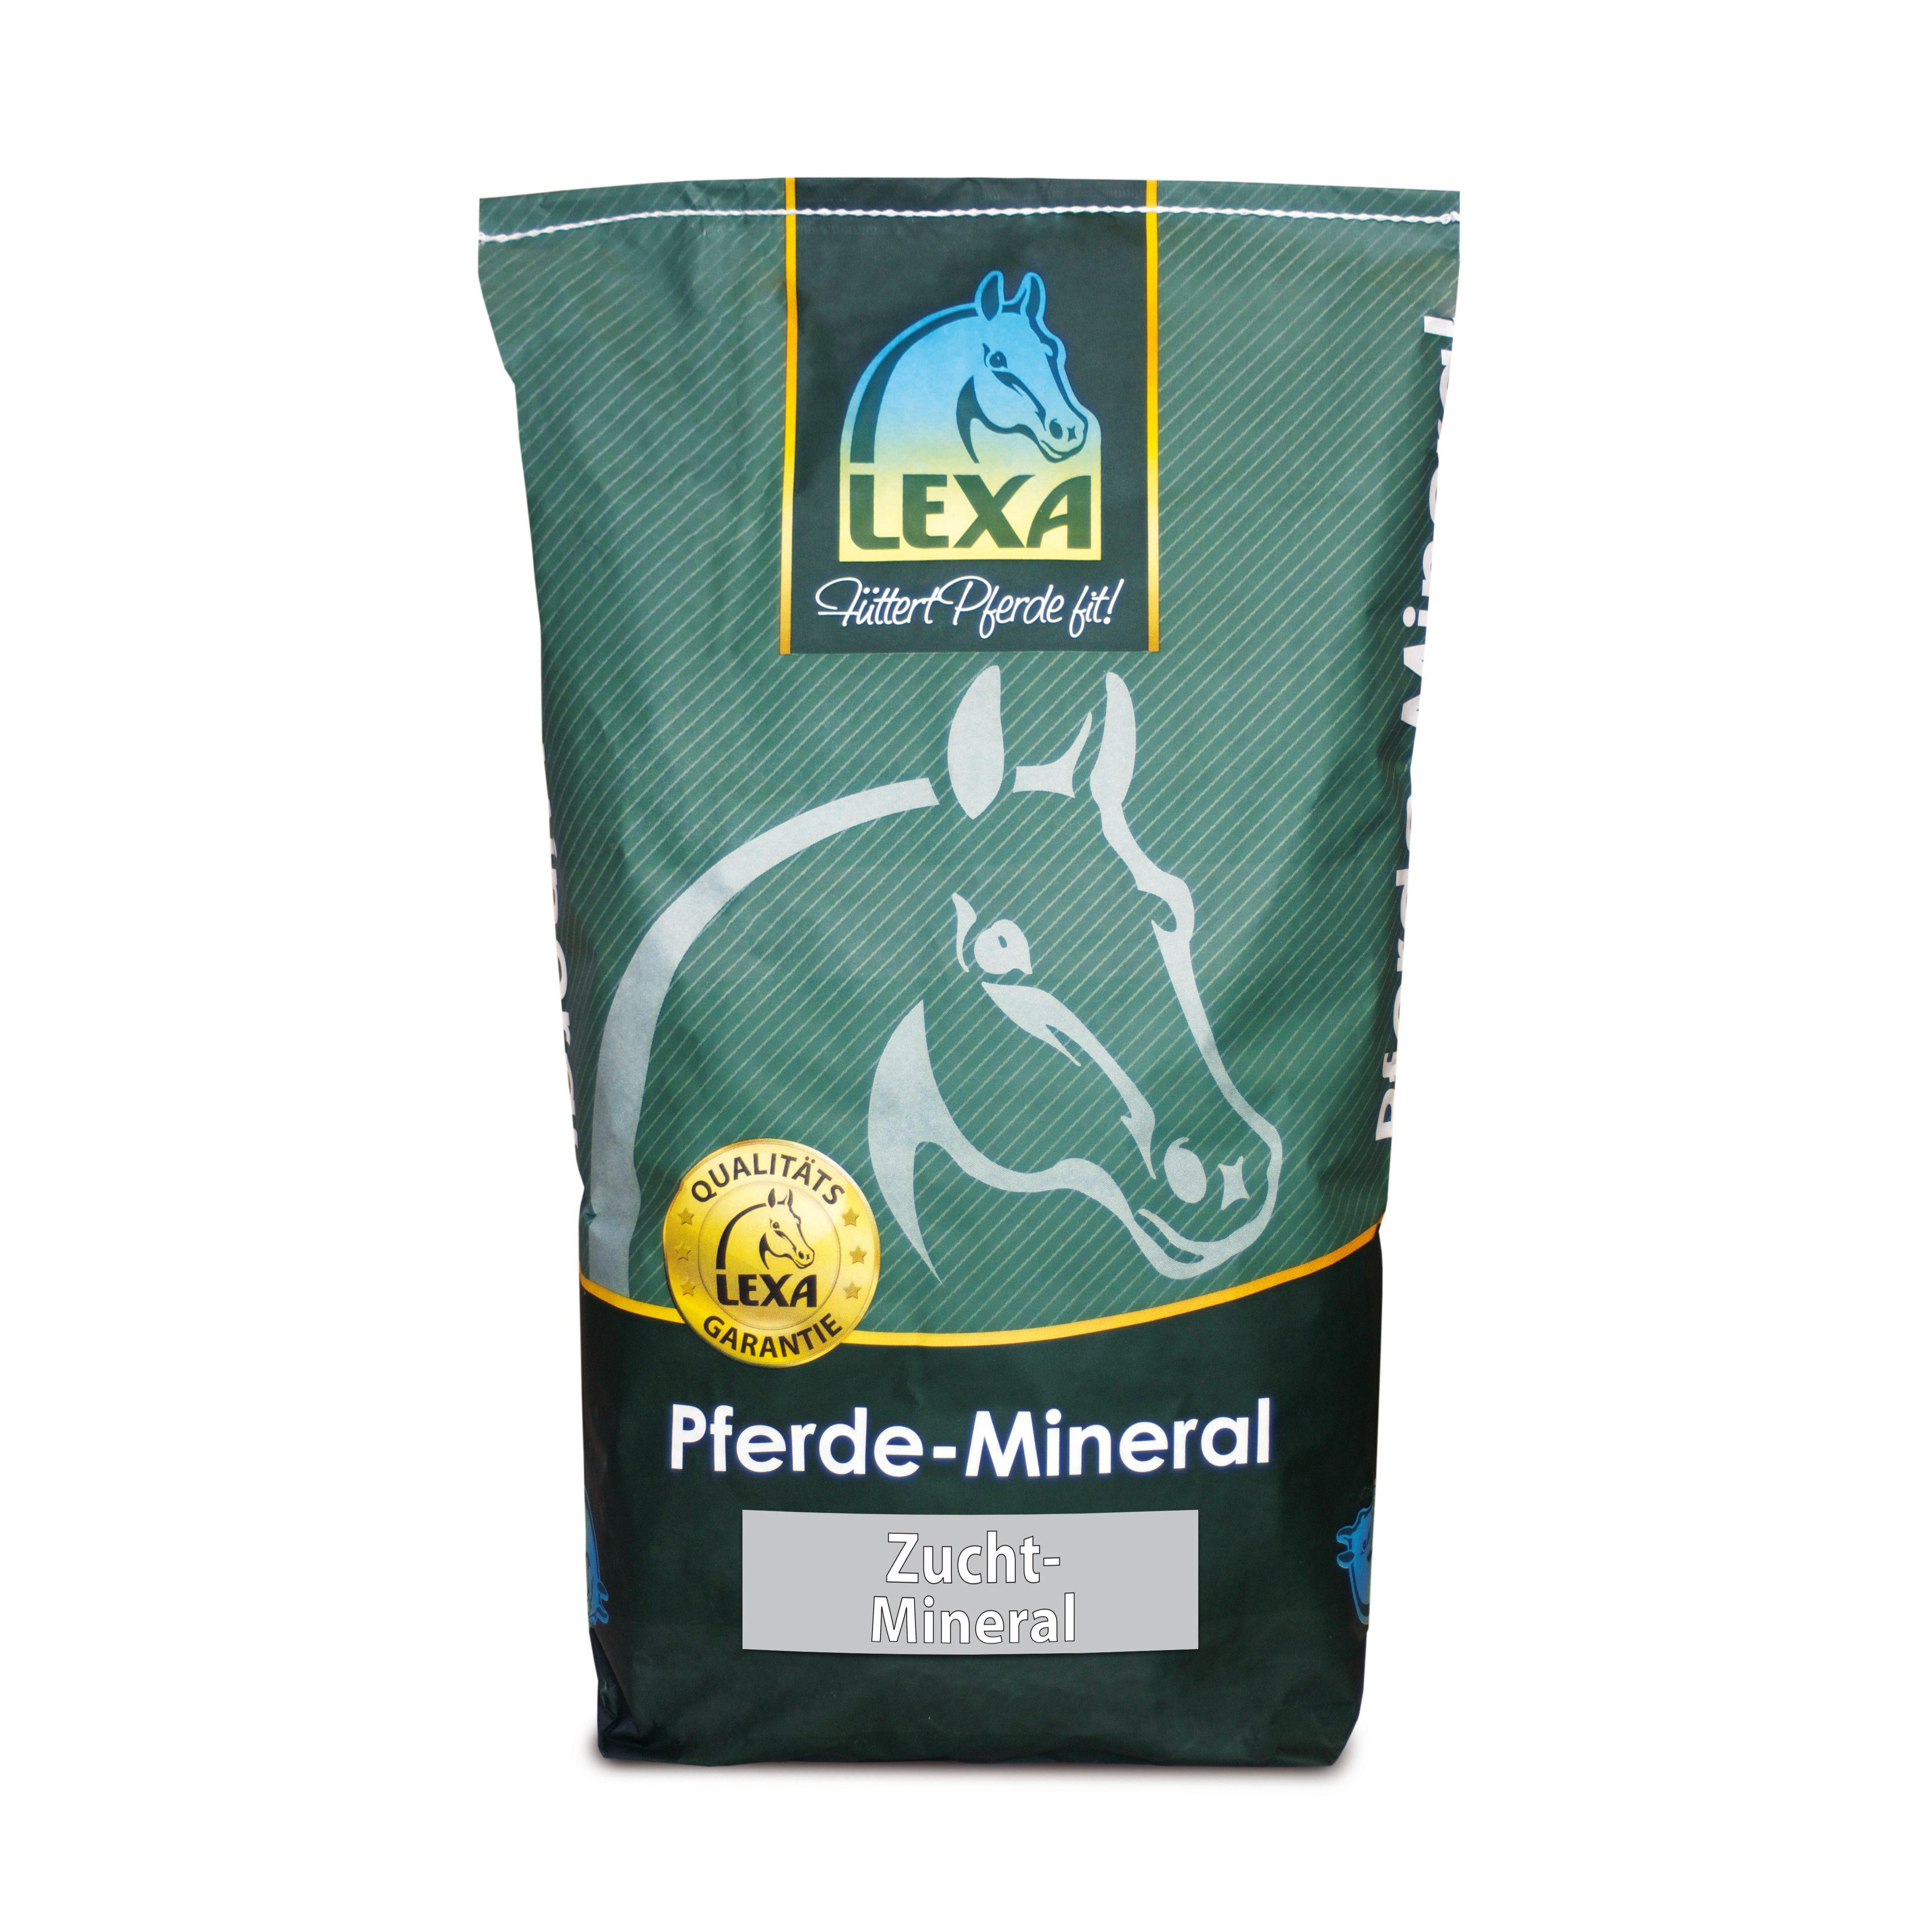 Lexa Zucht Mineral